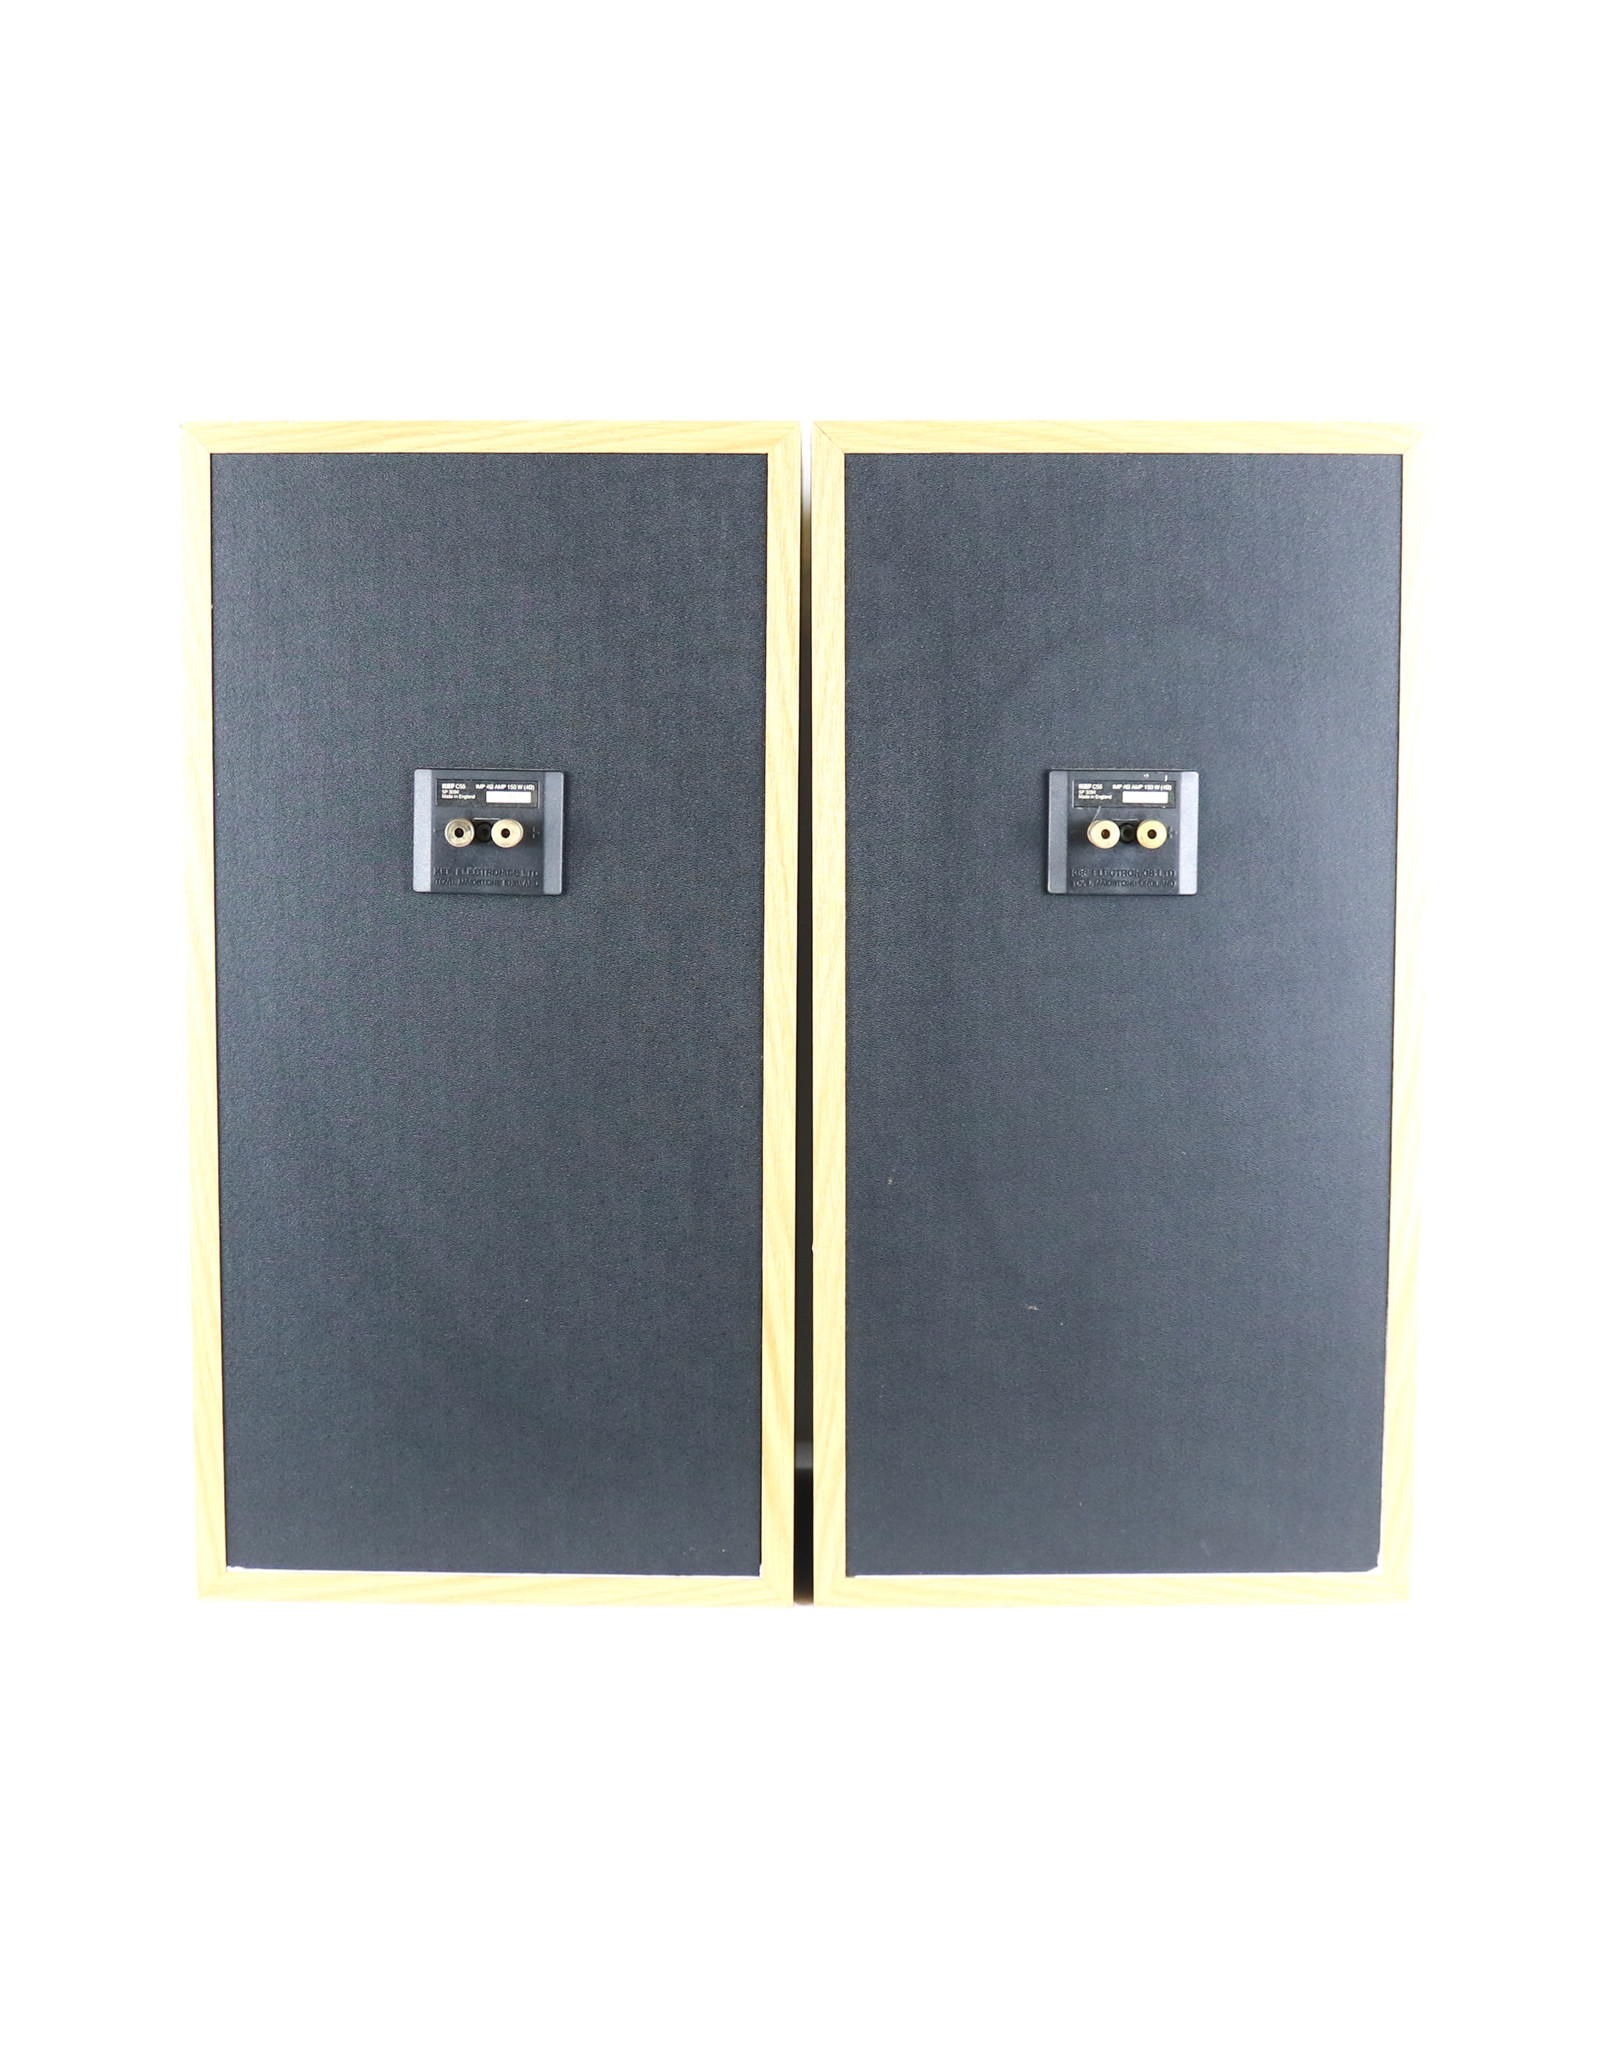 KEF KEF C55 Bookshelf Speakers USED